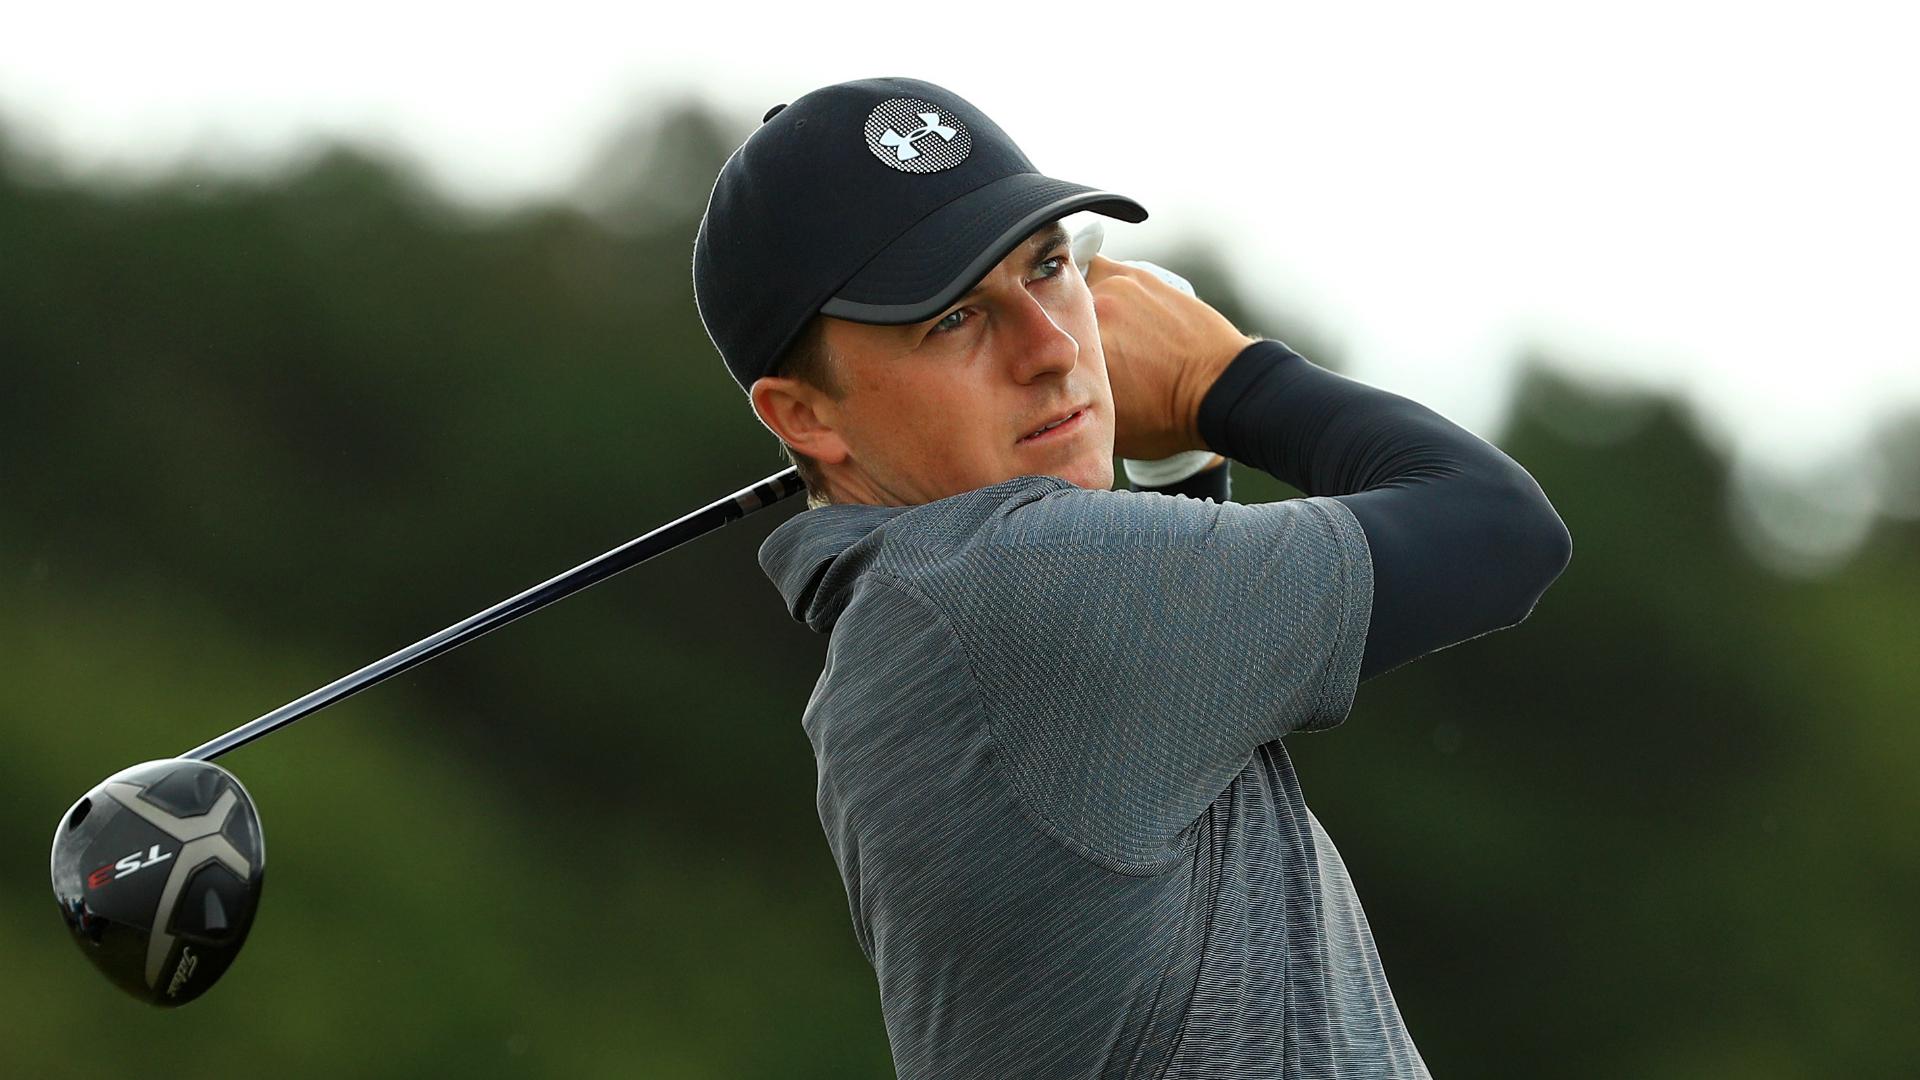 British Open 2019: Jordan Spieth's love for links golf stems from childhood memories